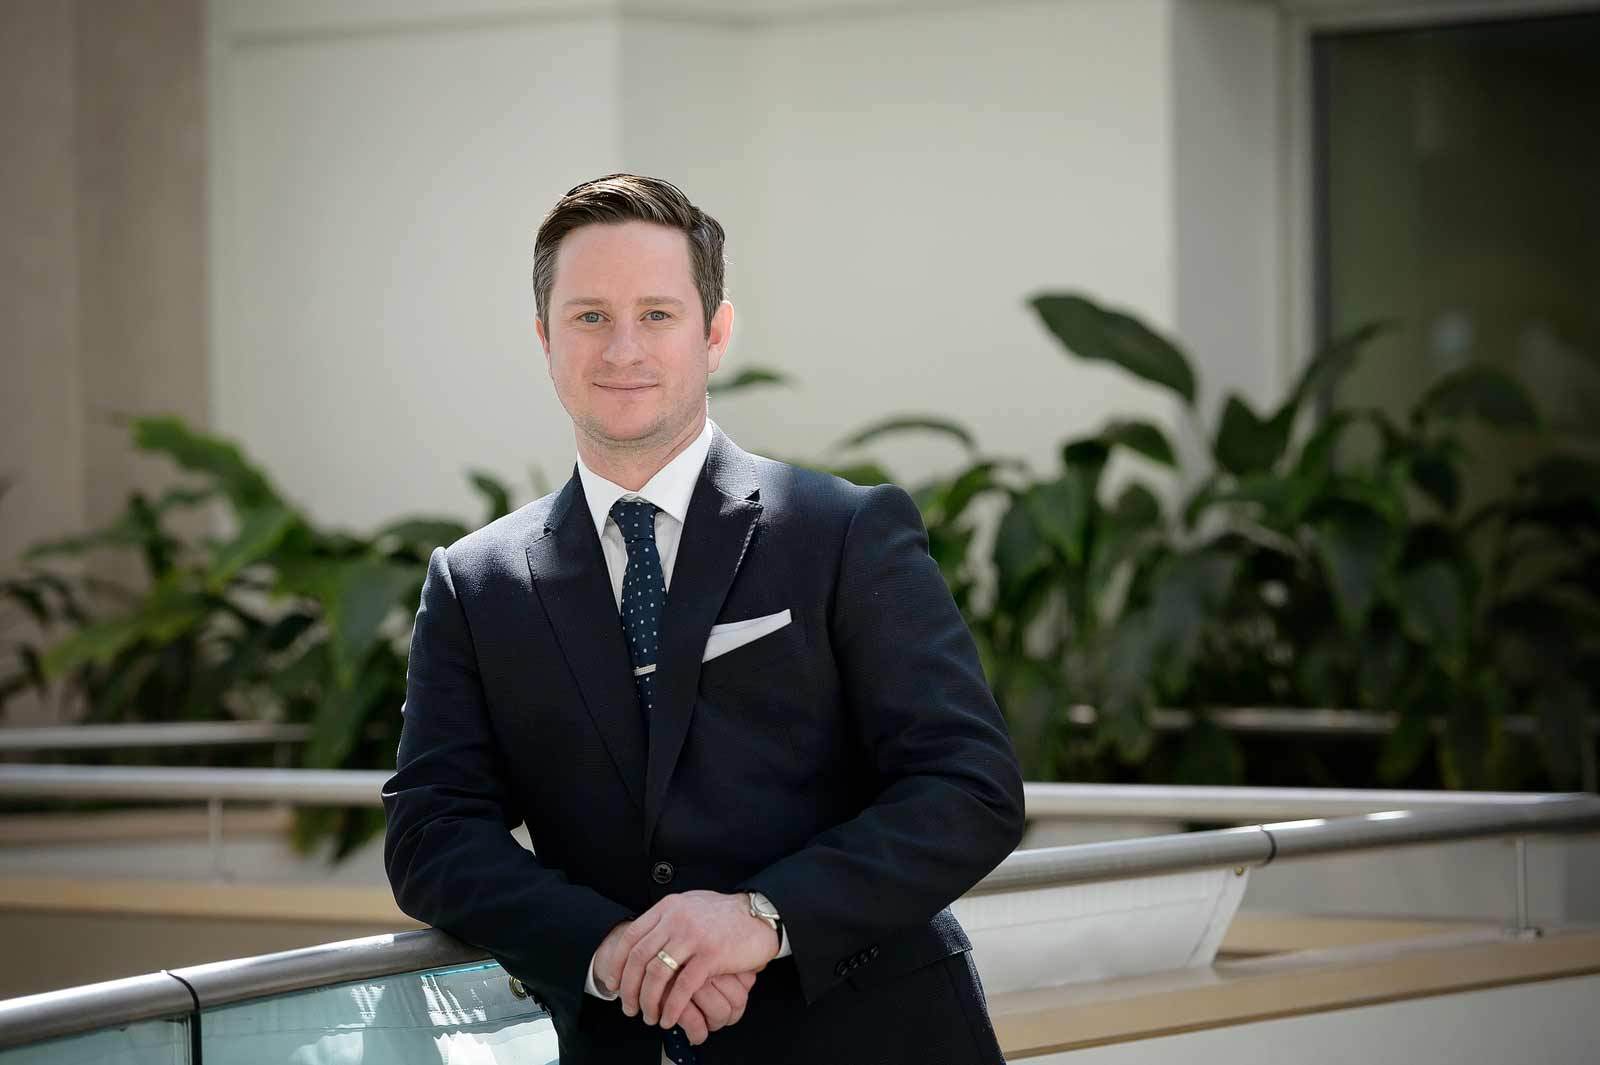 Derek MacLean mortgage broker's headshot in Ottawa